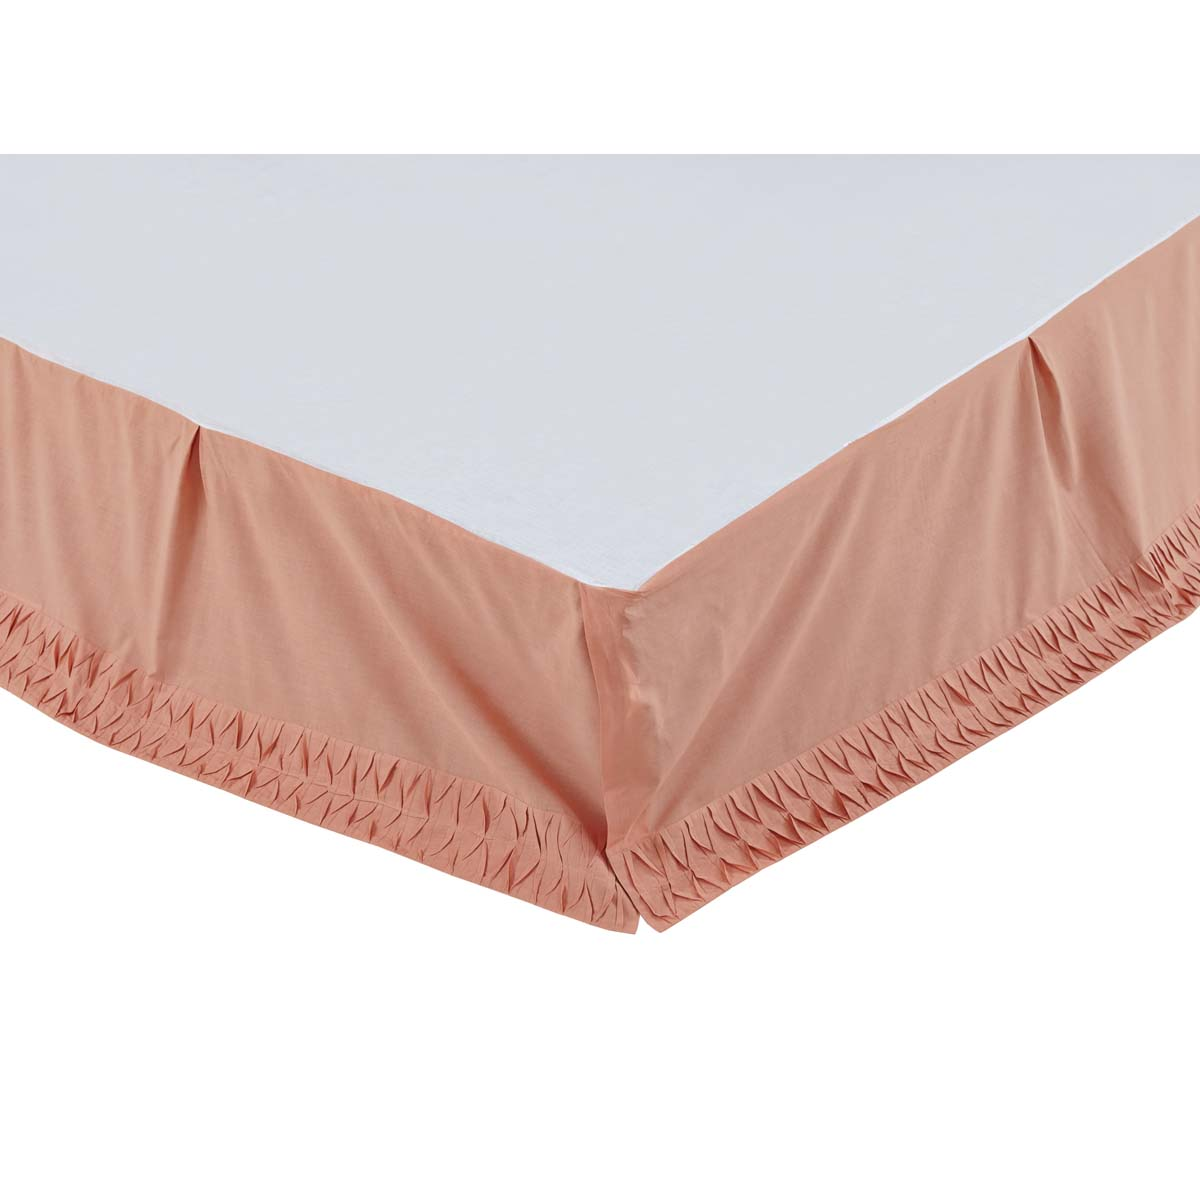 Adelia Apricot King Bed Skirt 78x80x16